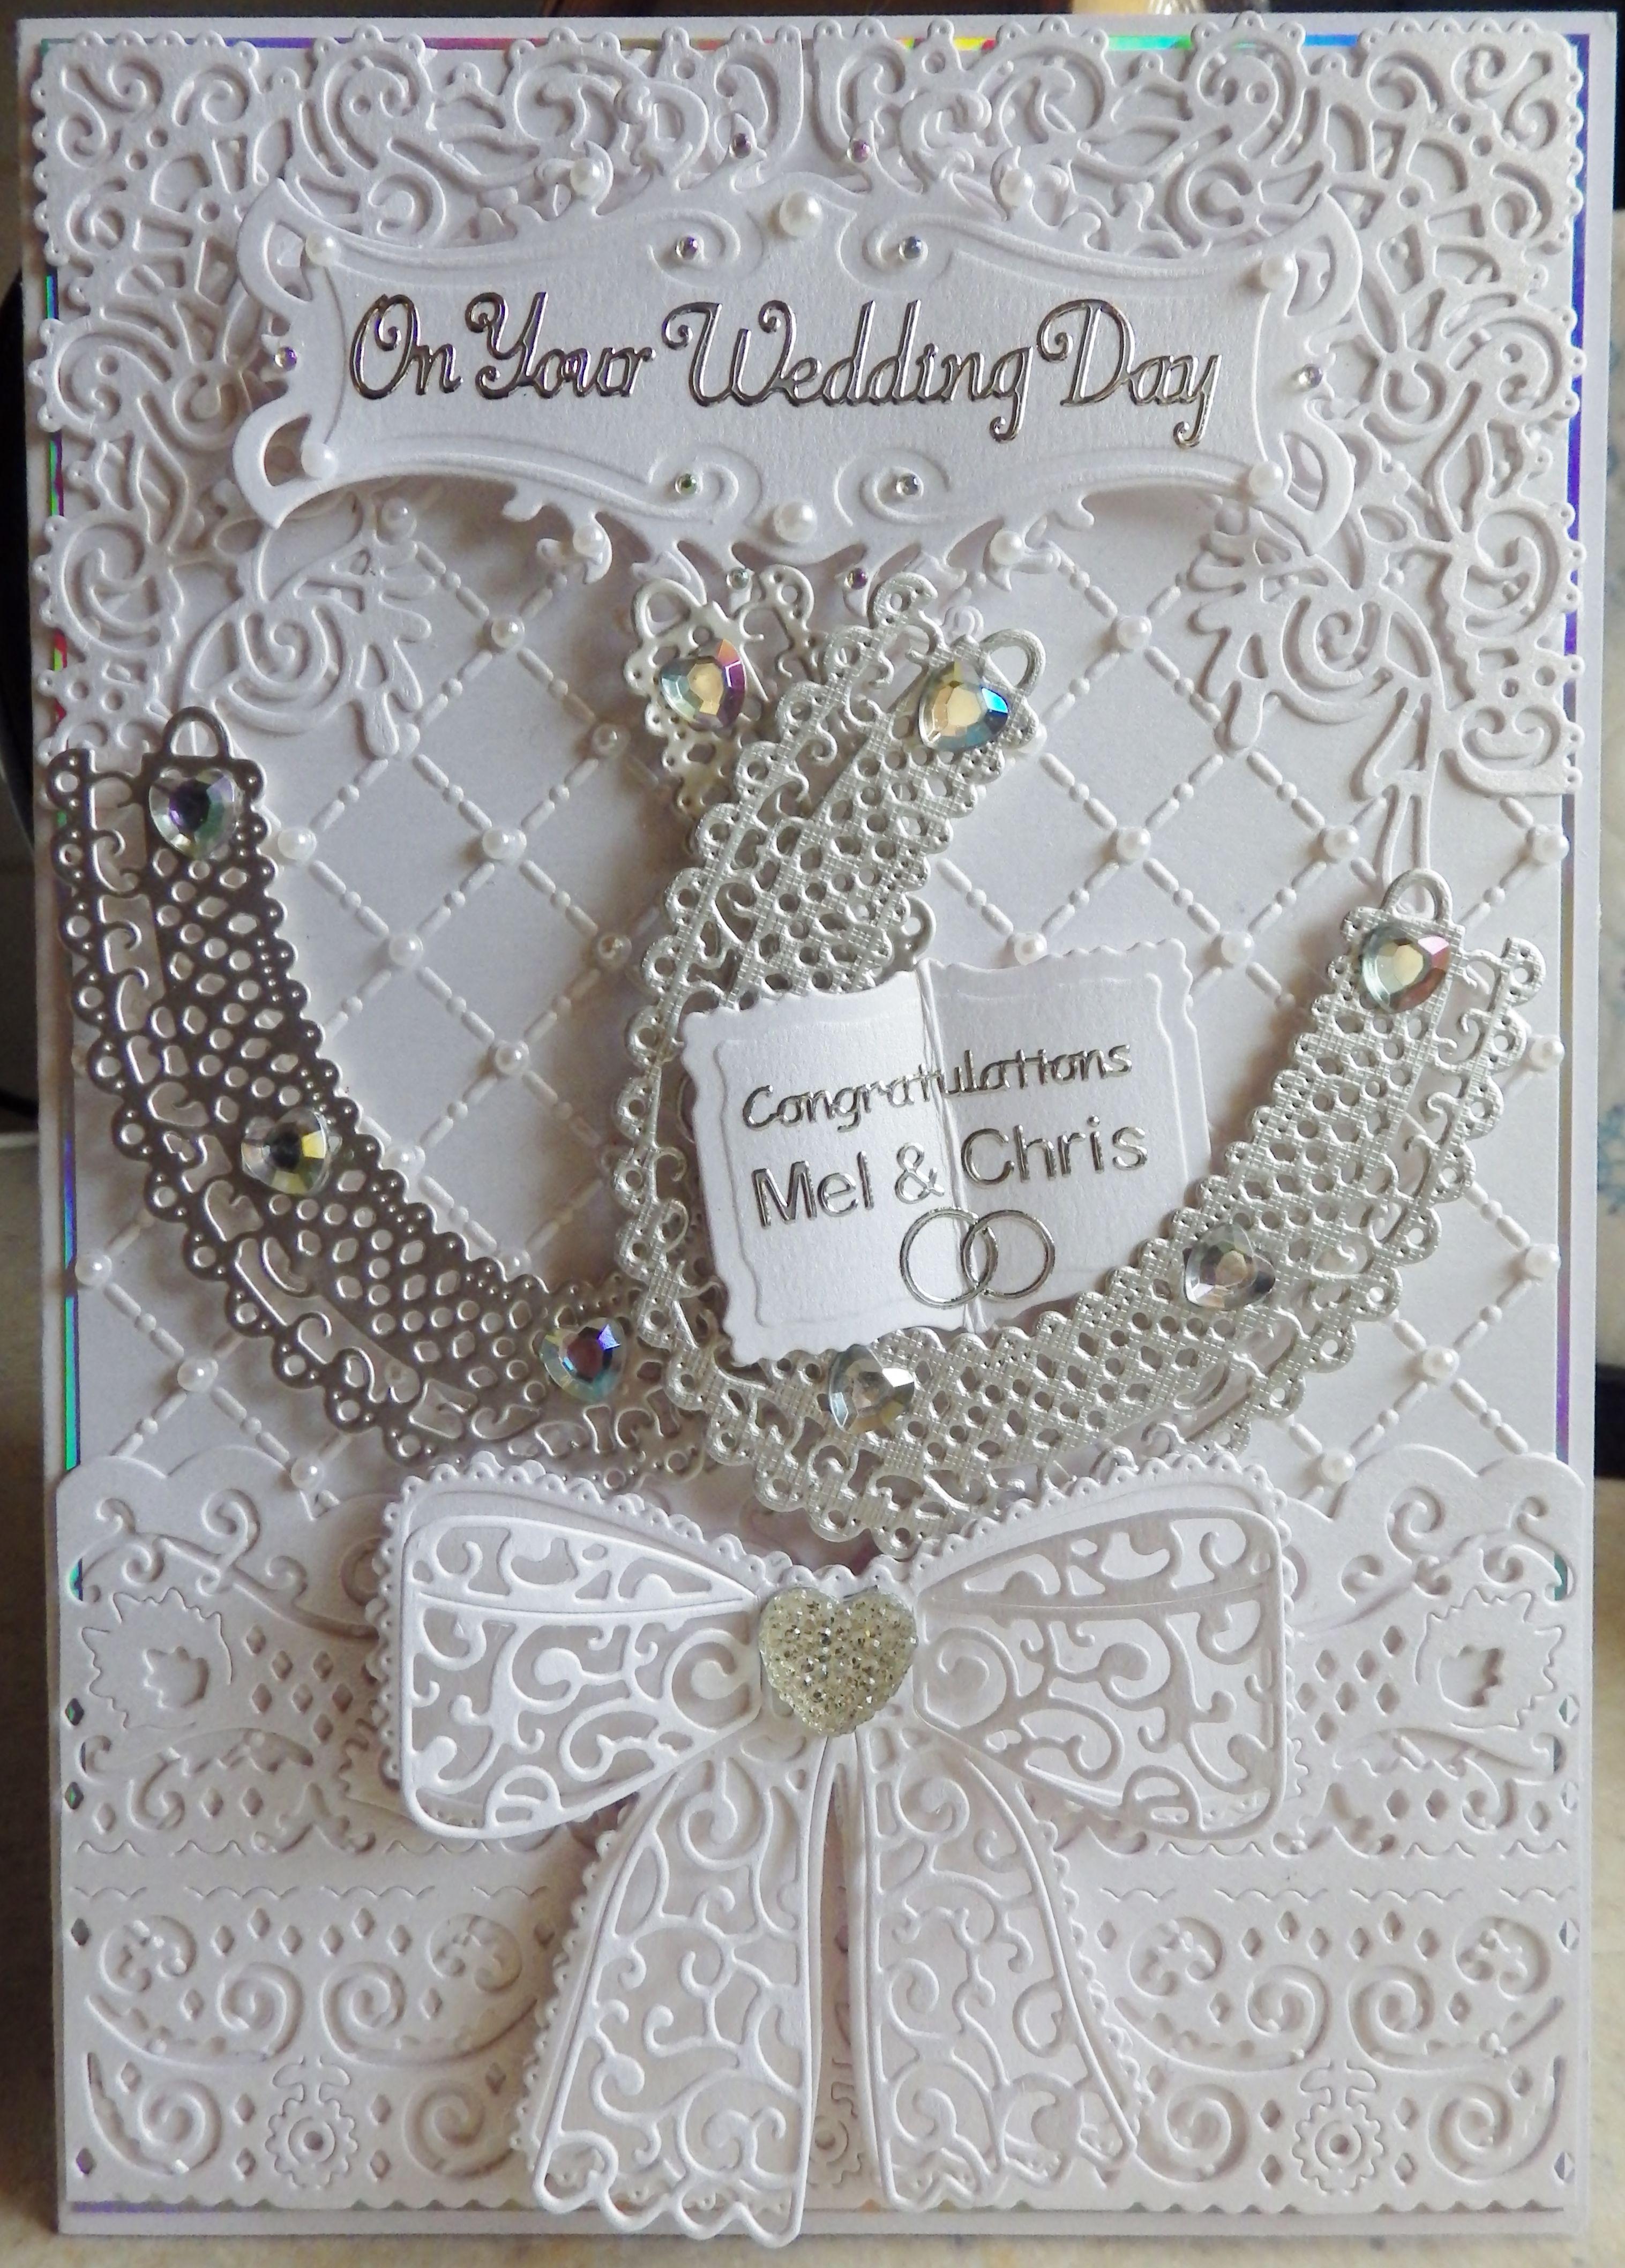 Pin By Genevieve Faciana On Handmade Cards Annscards4u Wedding Day Cards Wedding Cards Wedding Cards Handmade